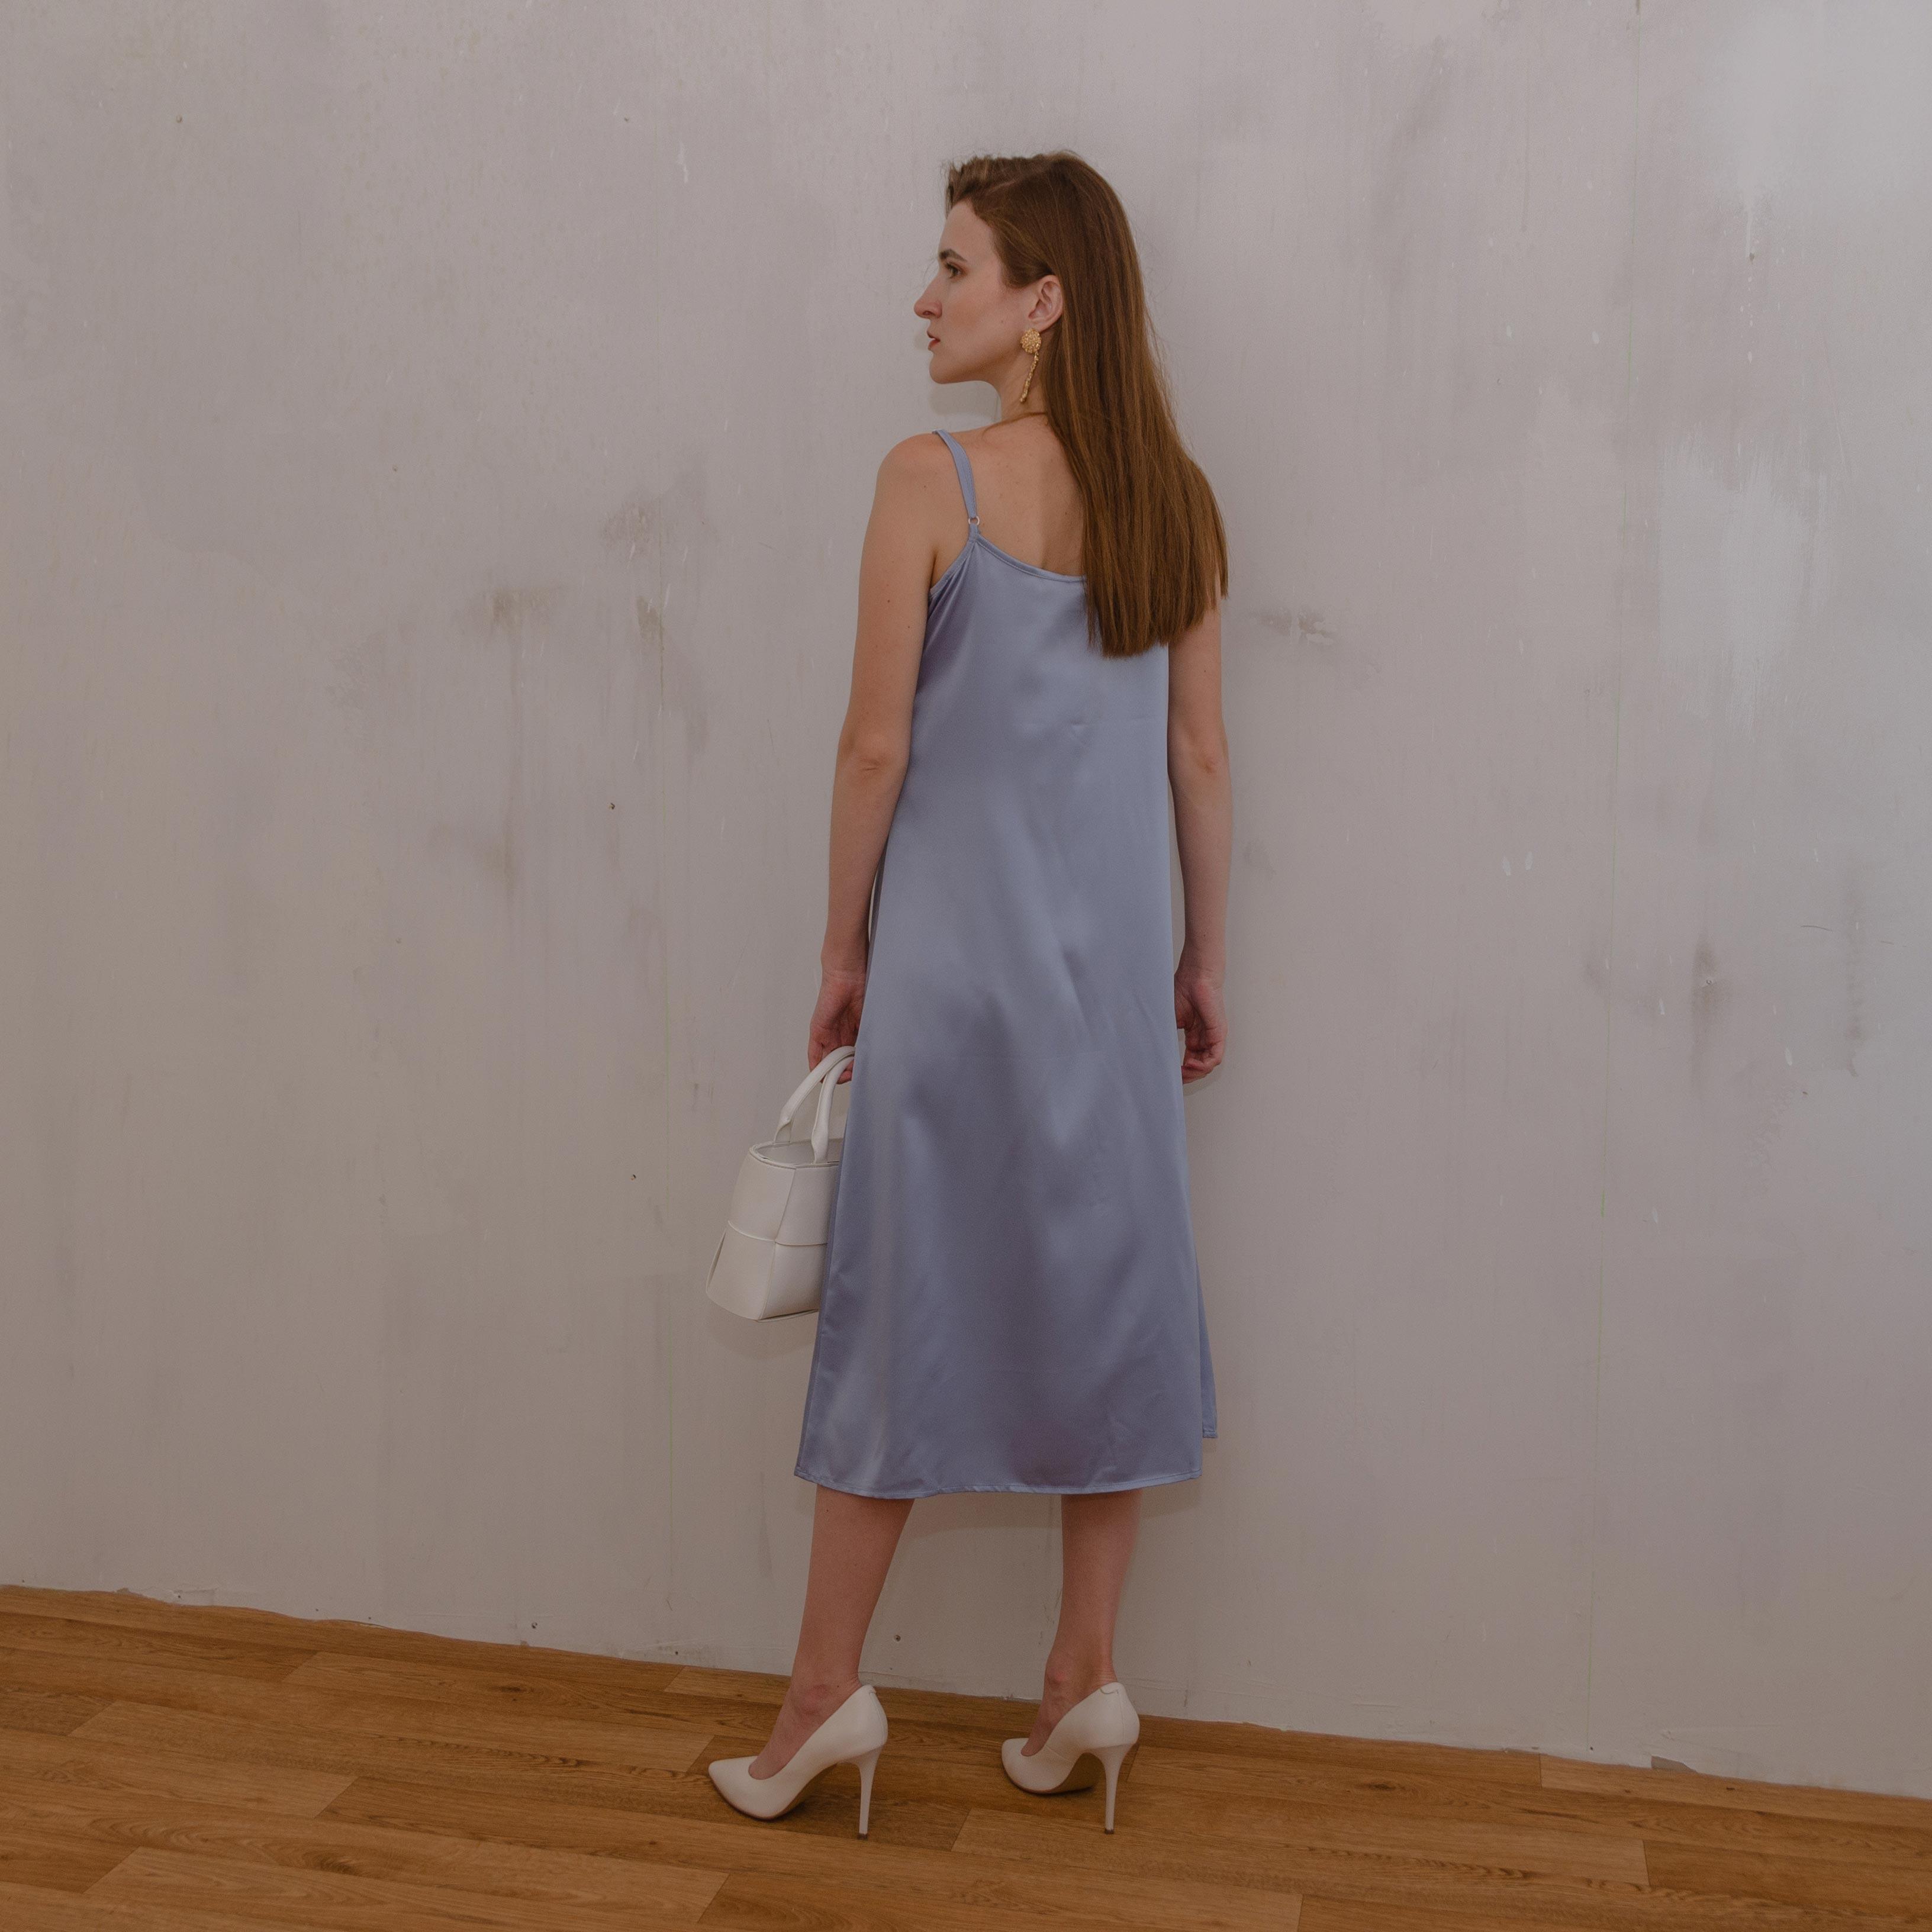 2021 Fashion Women's Dress Summer Spaghetti Satin Long Party Woman Sundress Midi Robe Female Clothing Plus Size S 4XL M30262|Dresses|   - AliExpress